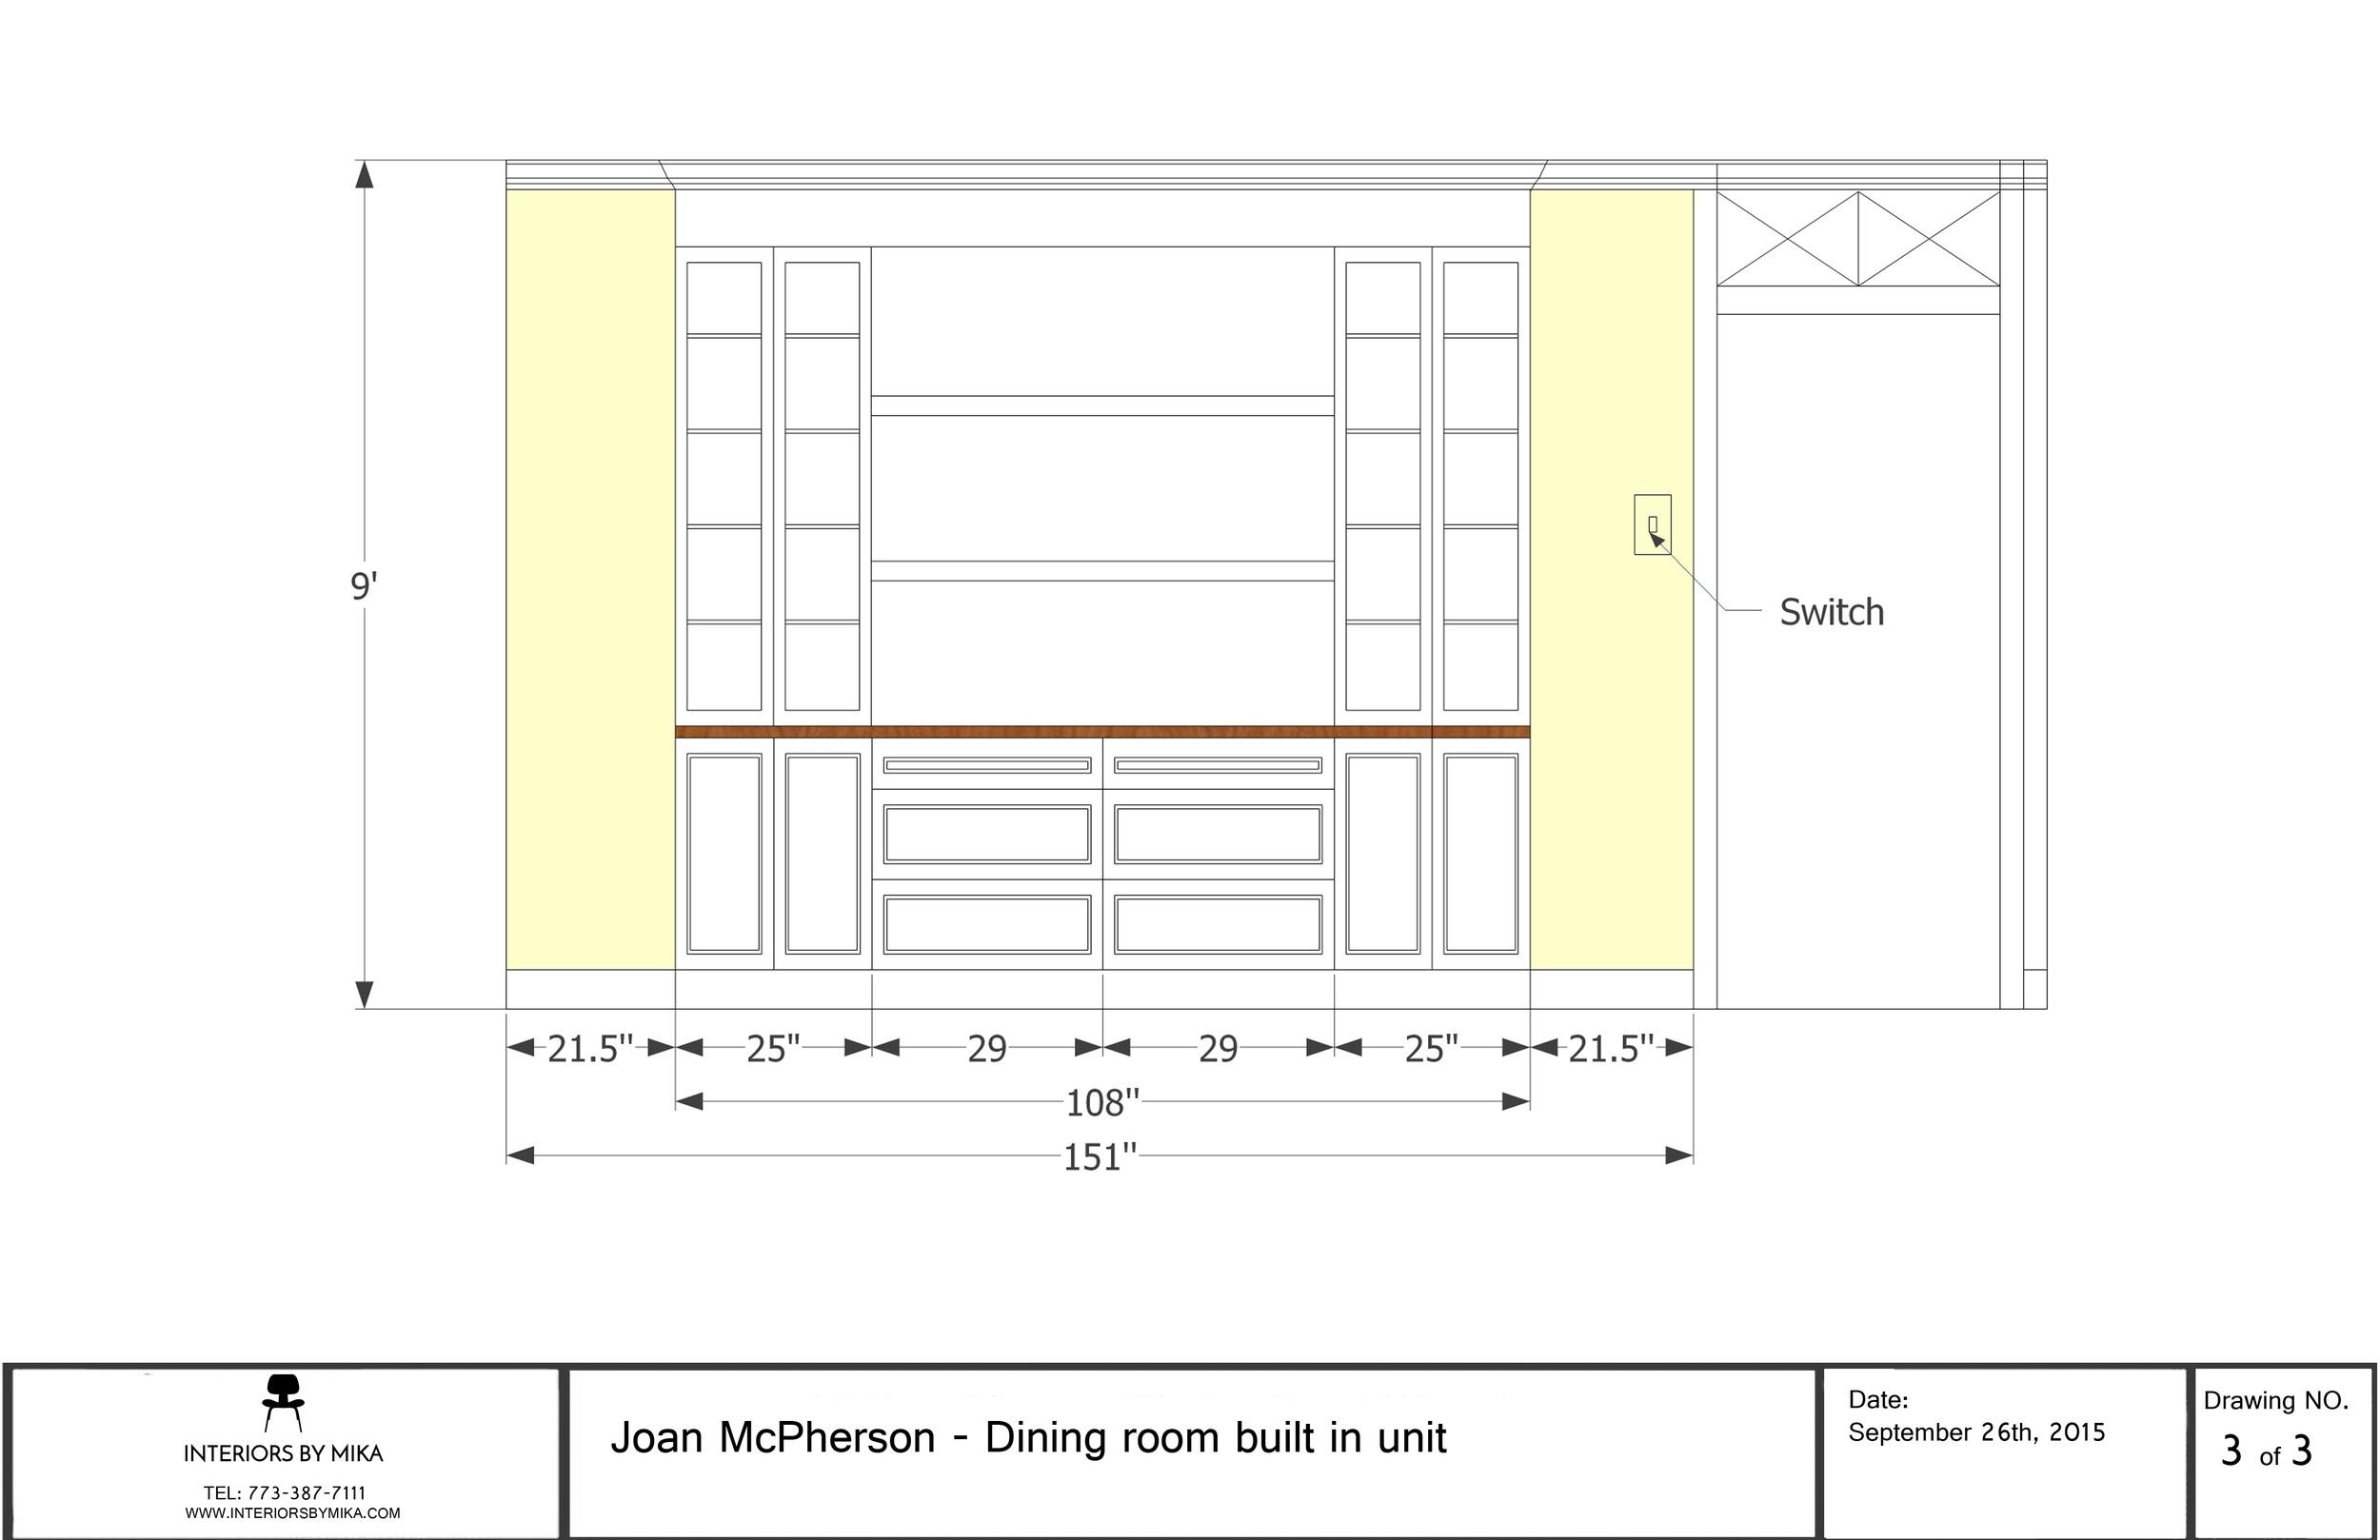 9 feet - drawing 3.jpg